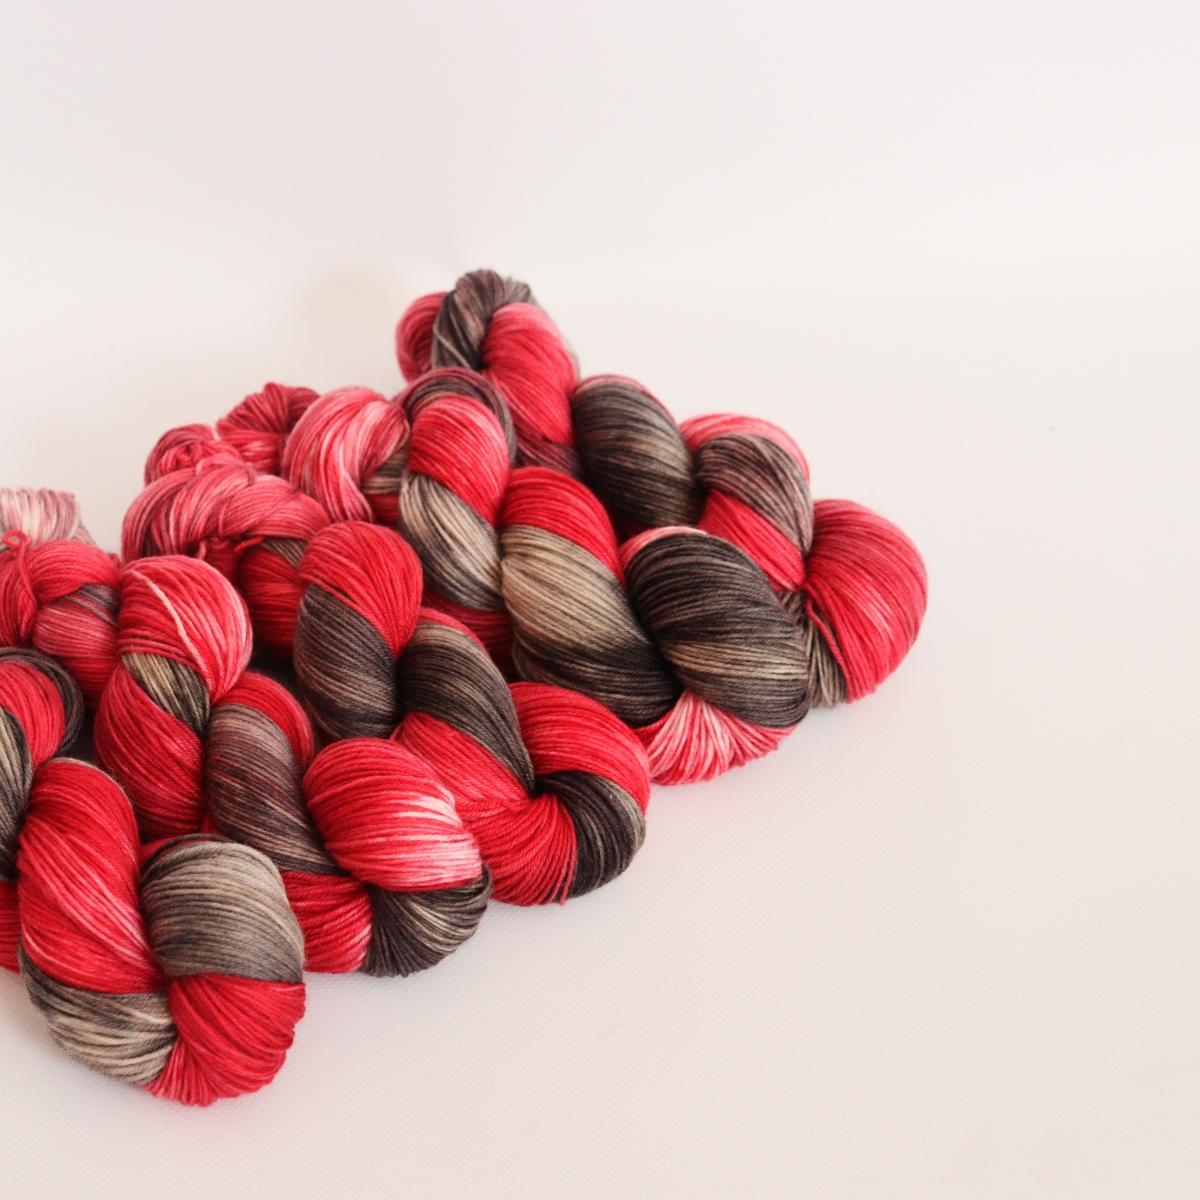 woodico.pro hand dyed yarn 056 1200x1200 - Hand dyed yarn / 056